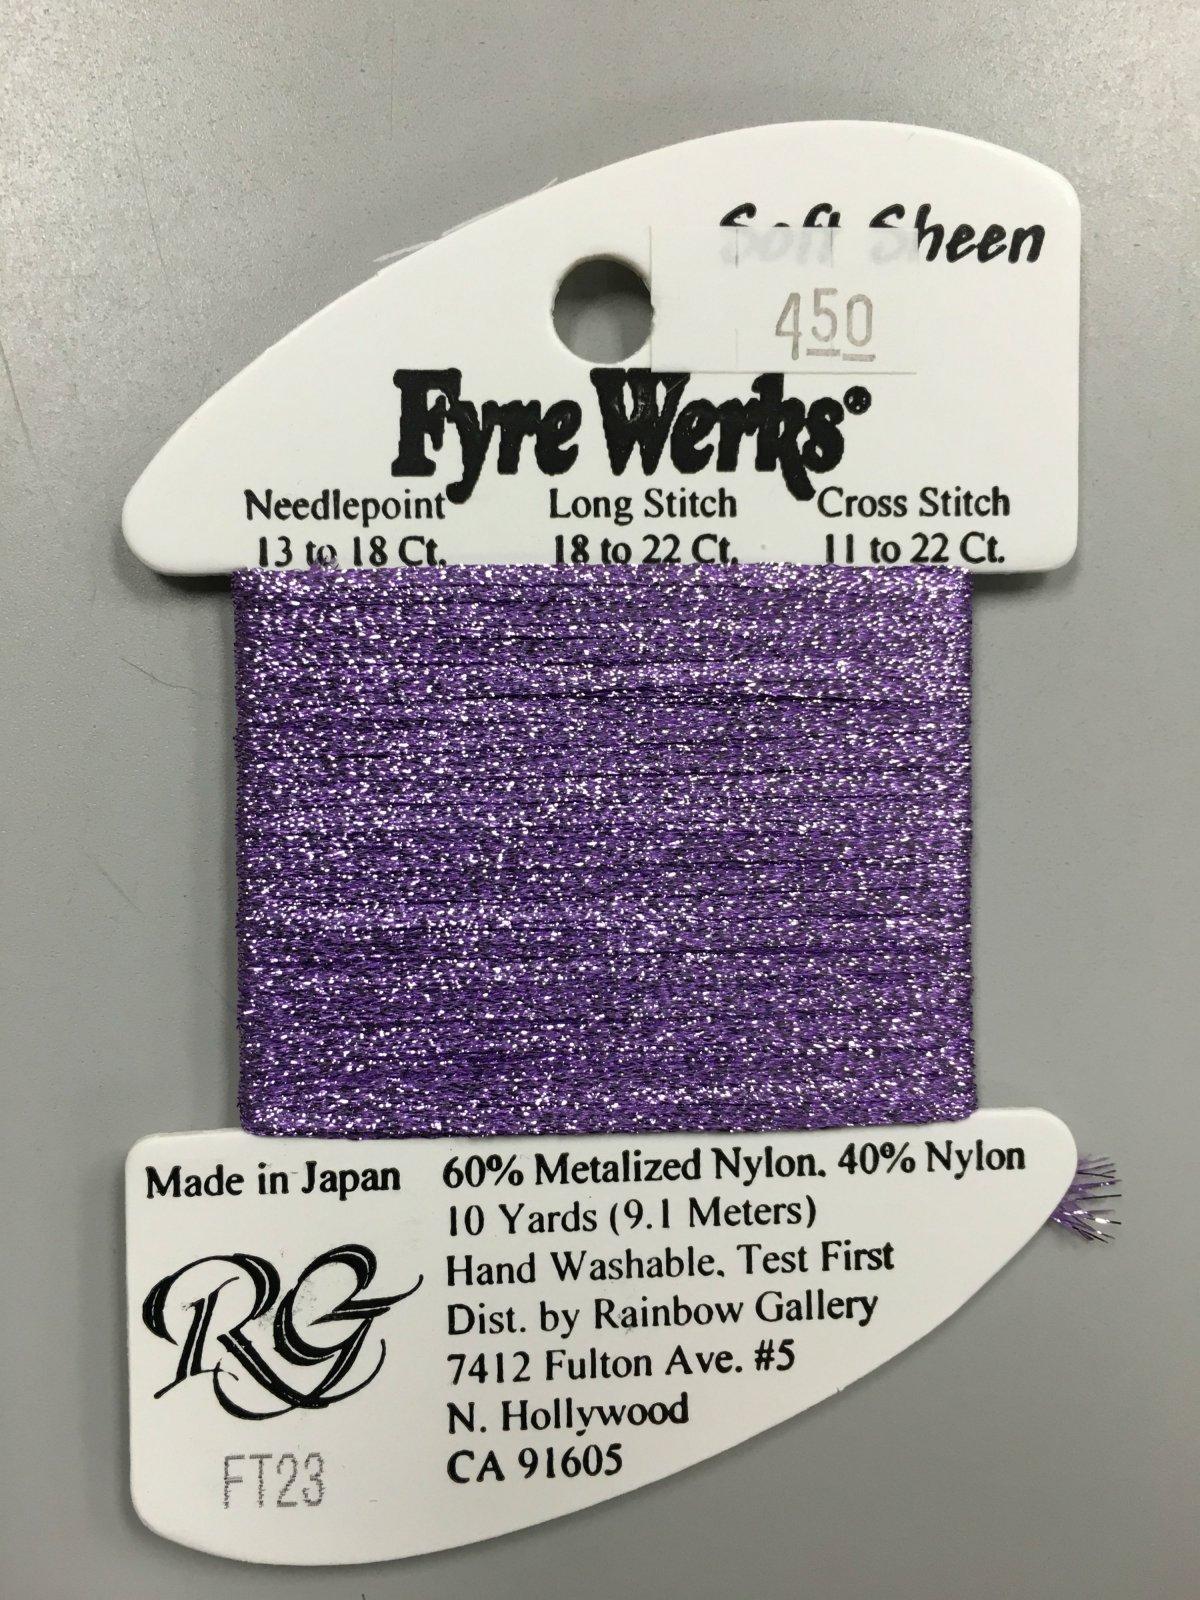 Fyre Werks Soft Sheen FT23